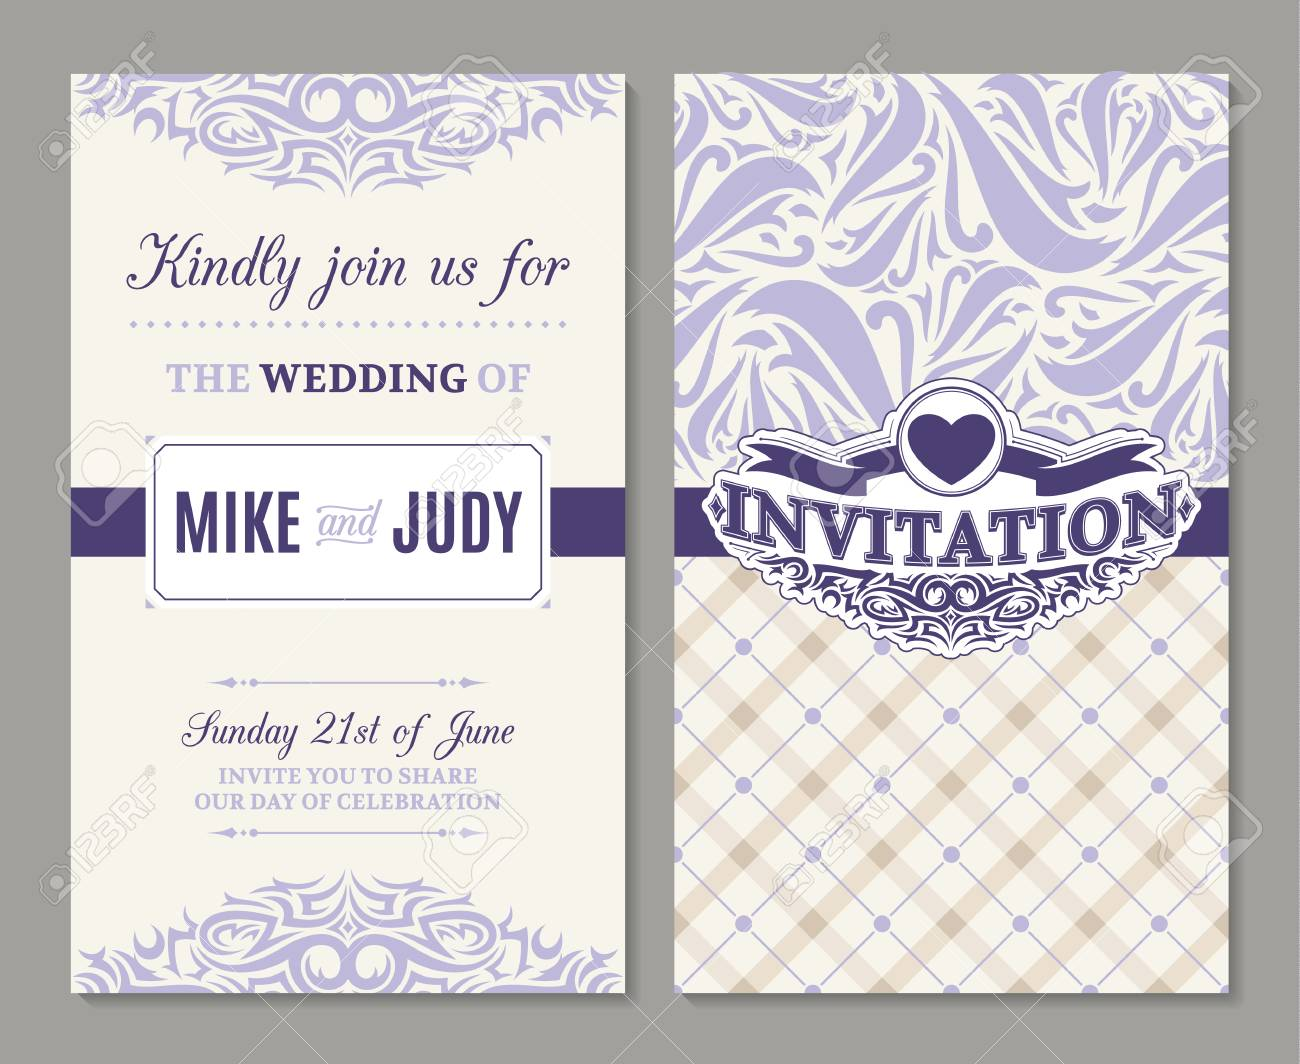 Beautiful Wedding Announcements.Vector Beautiful Ornate Wedding Invitation Announcements Or